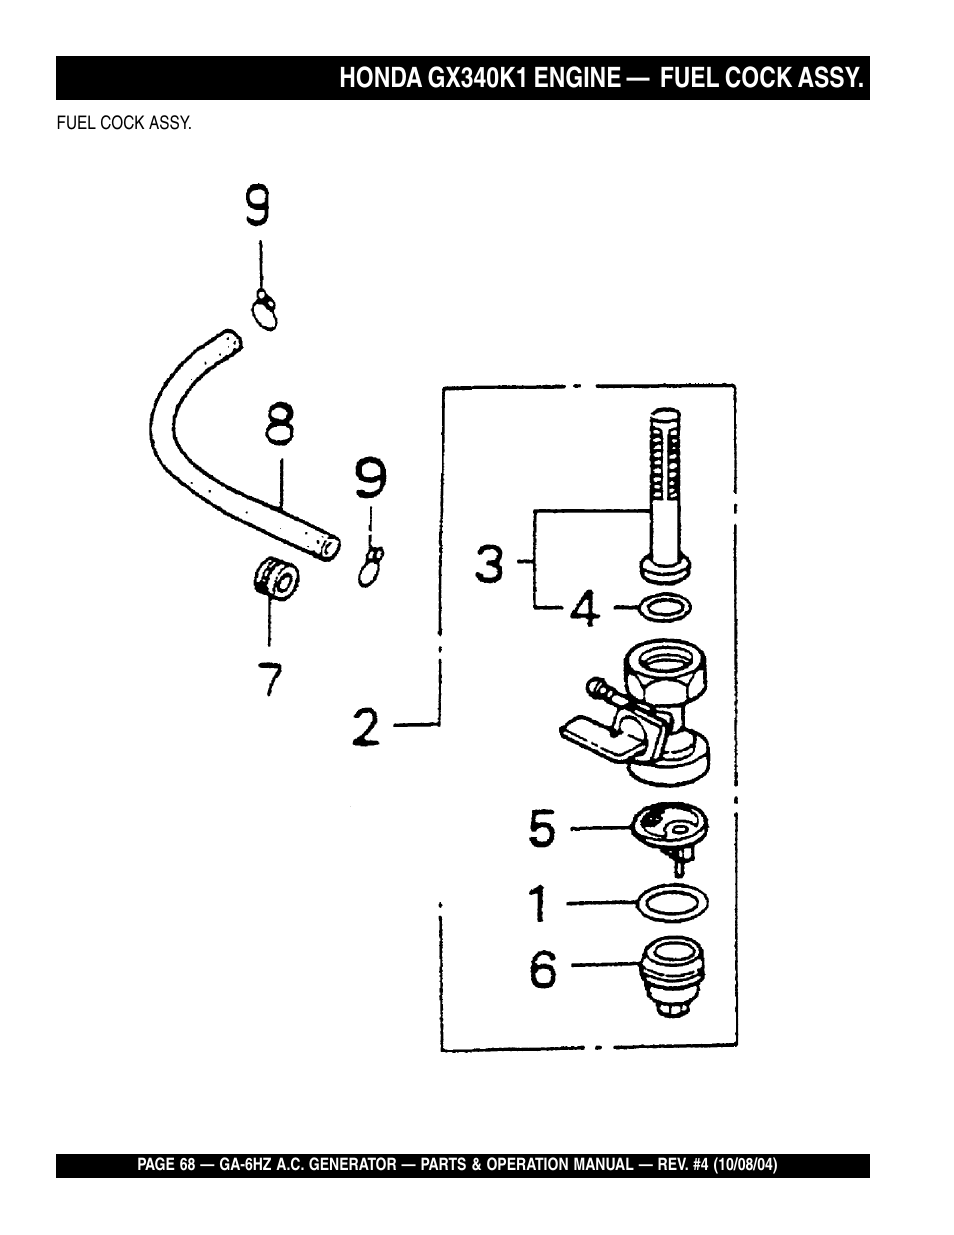 Honda Generator Wiring Diagram Free Download Wiring Diagram Also Honda